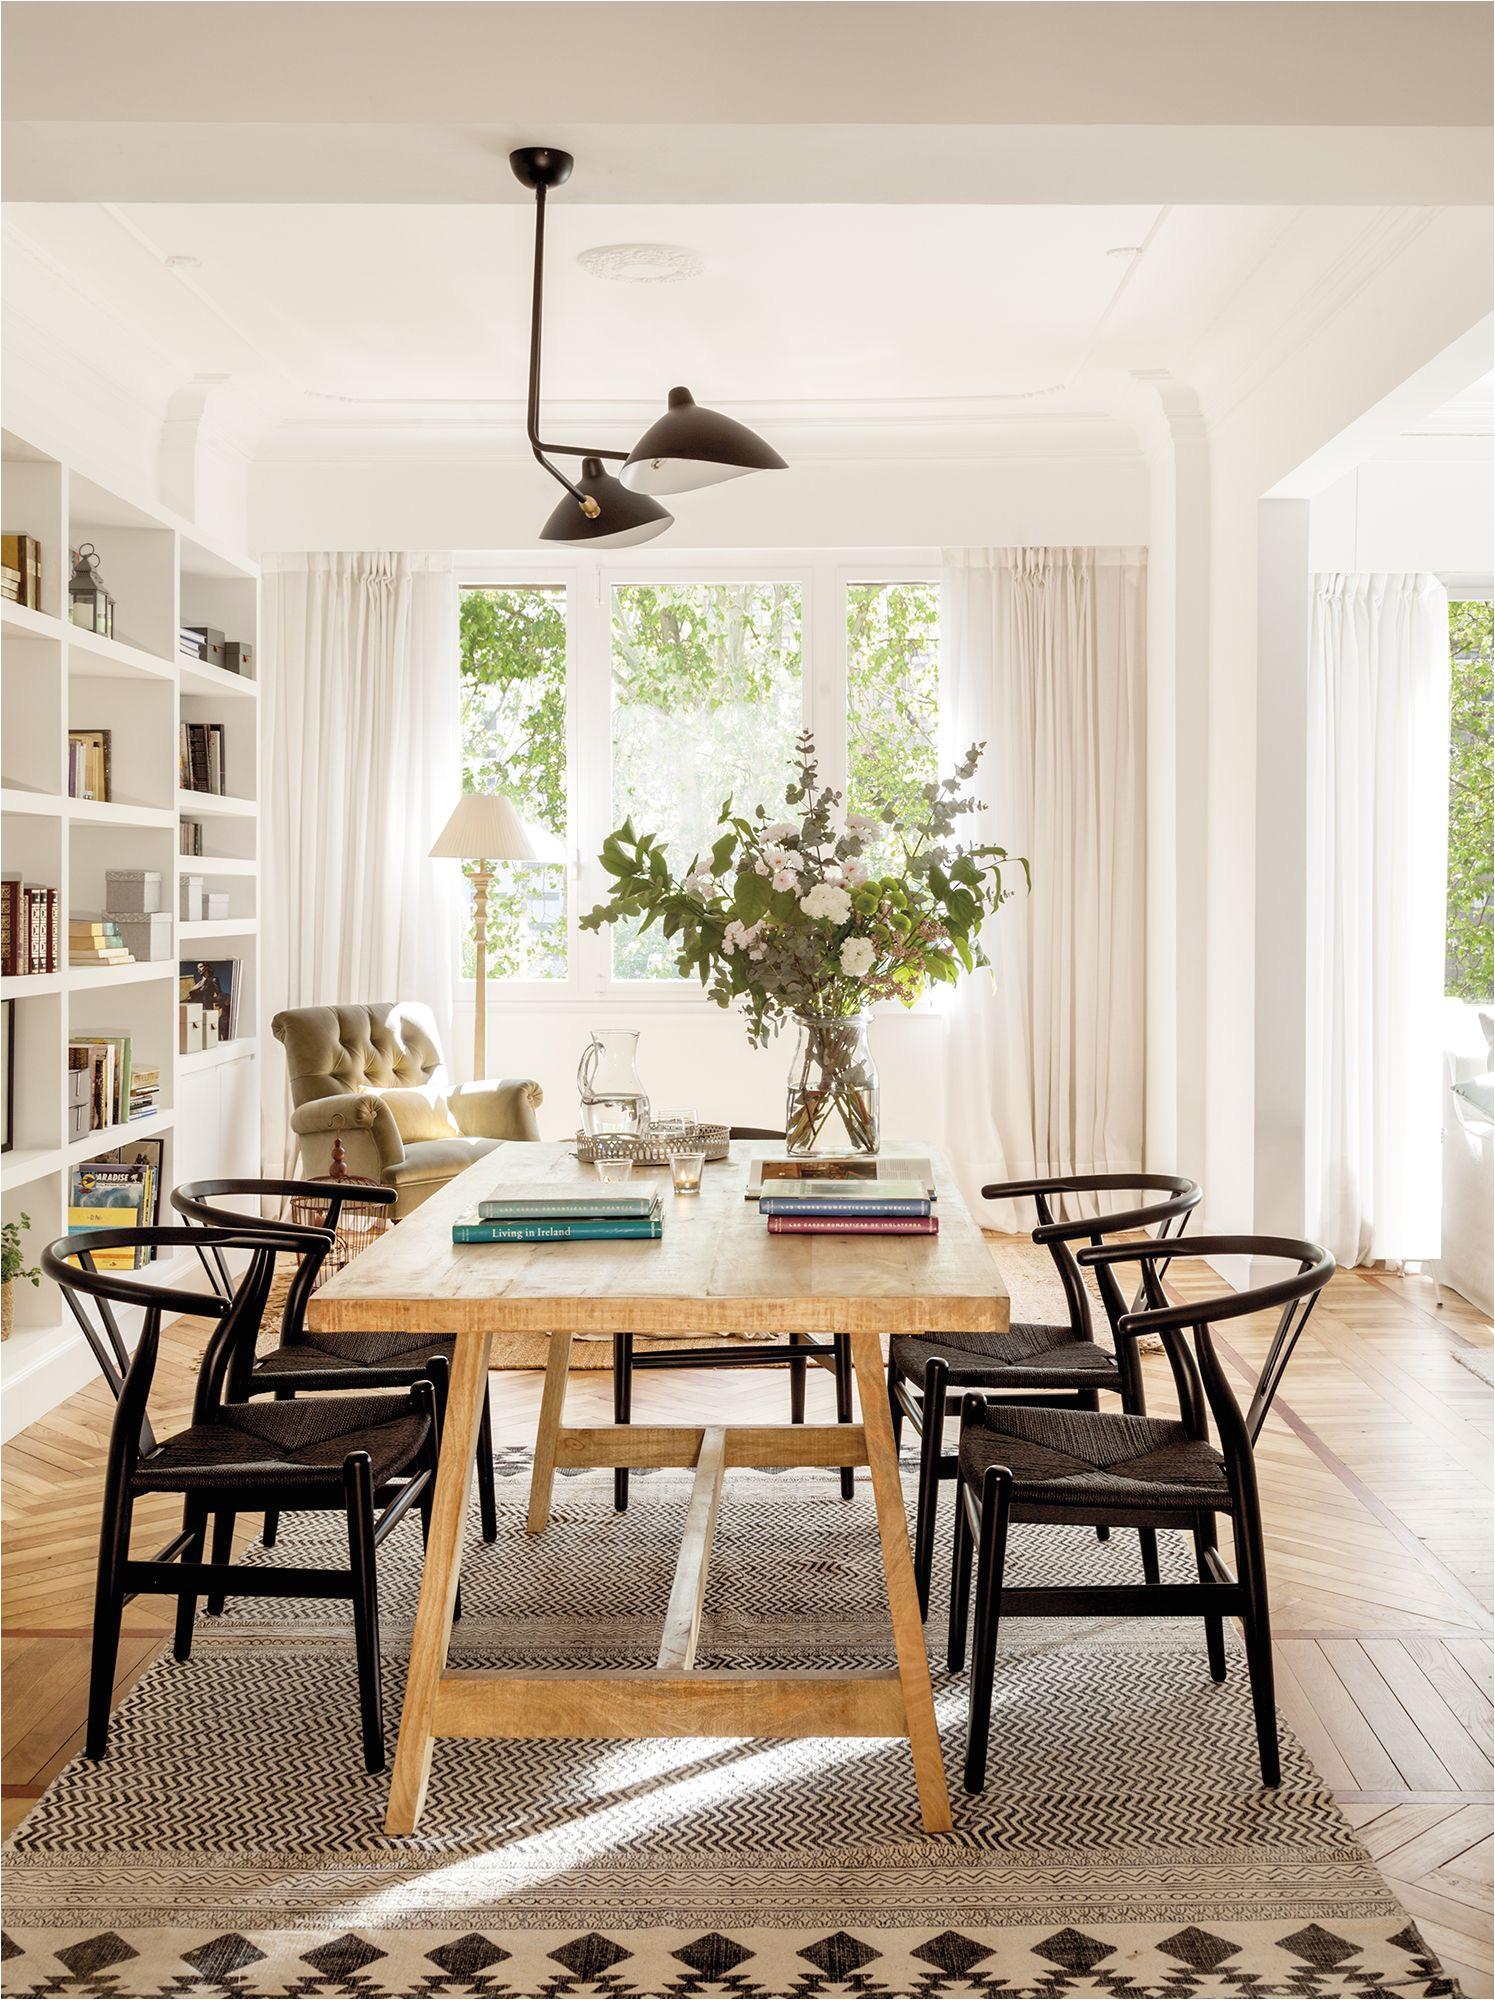 Muebles En orlando Florida Mg 0307 1 1 El Mueble Pinterest Salons Room and Decoration